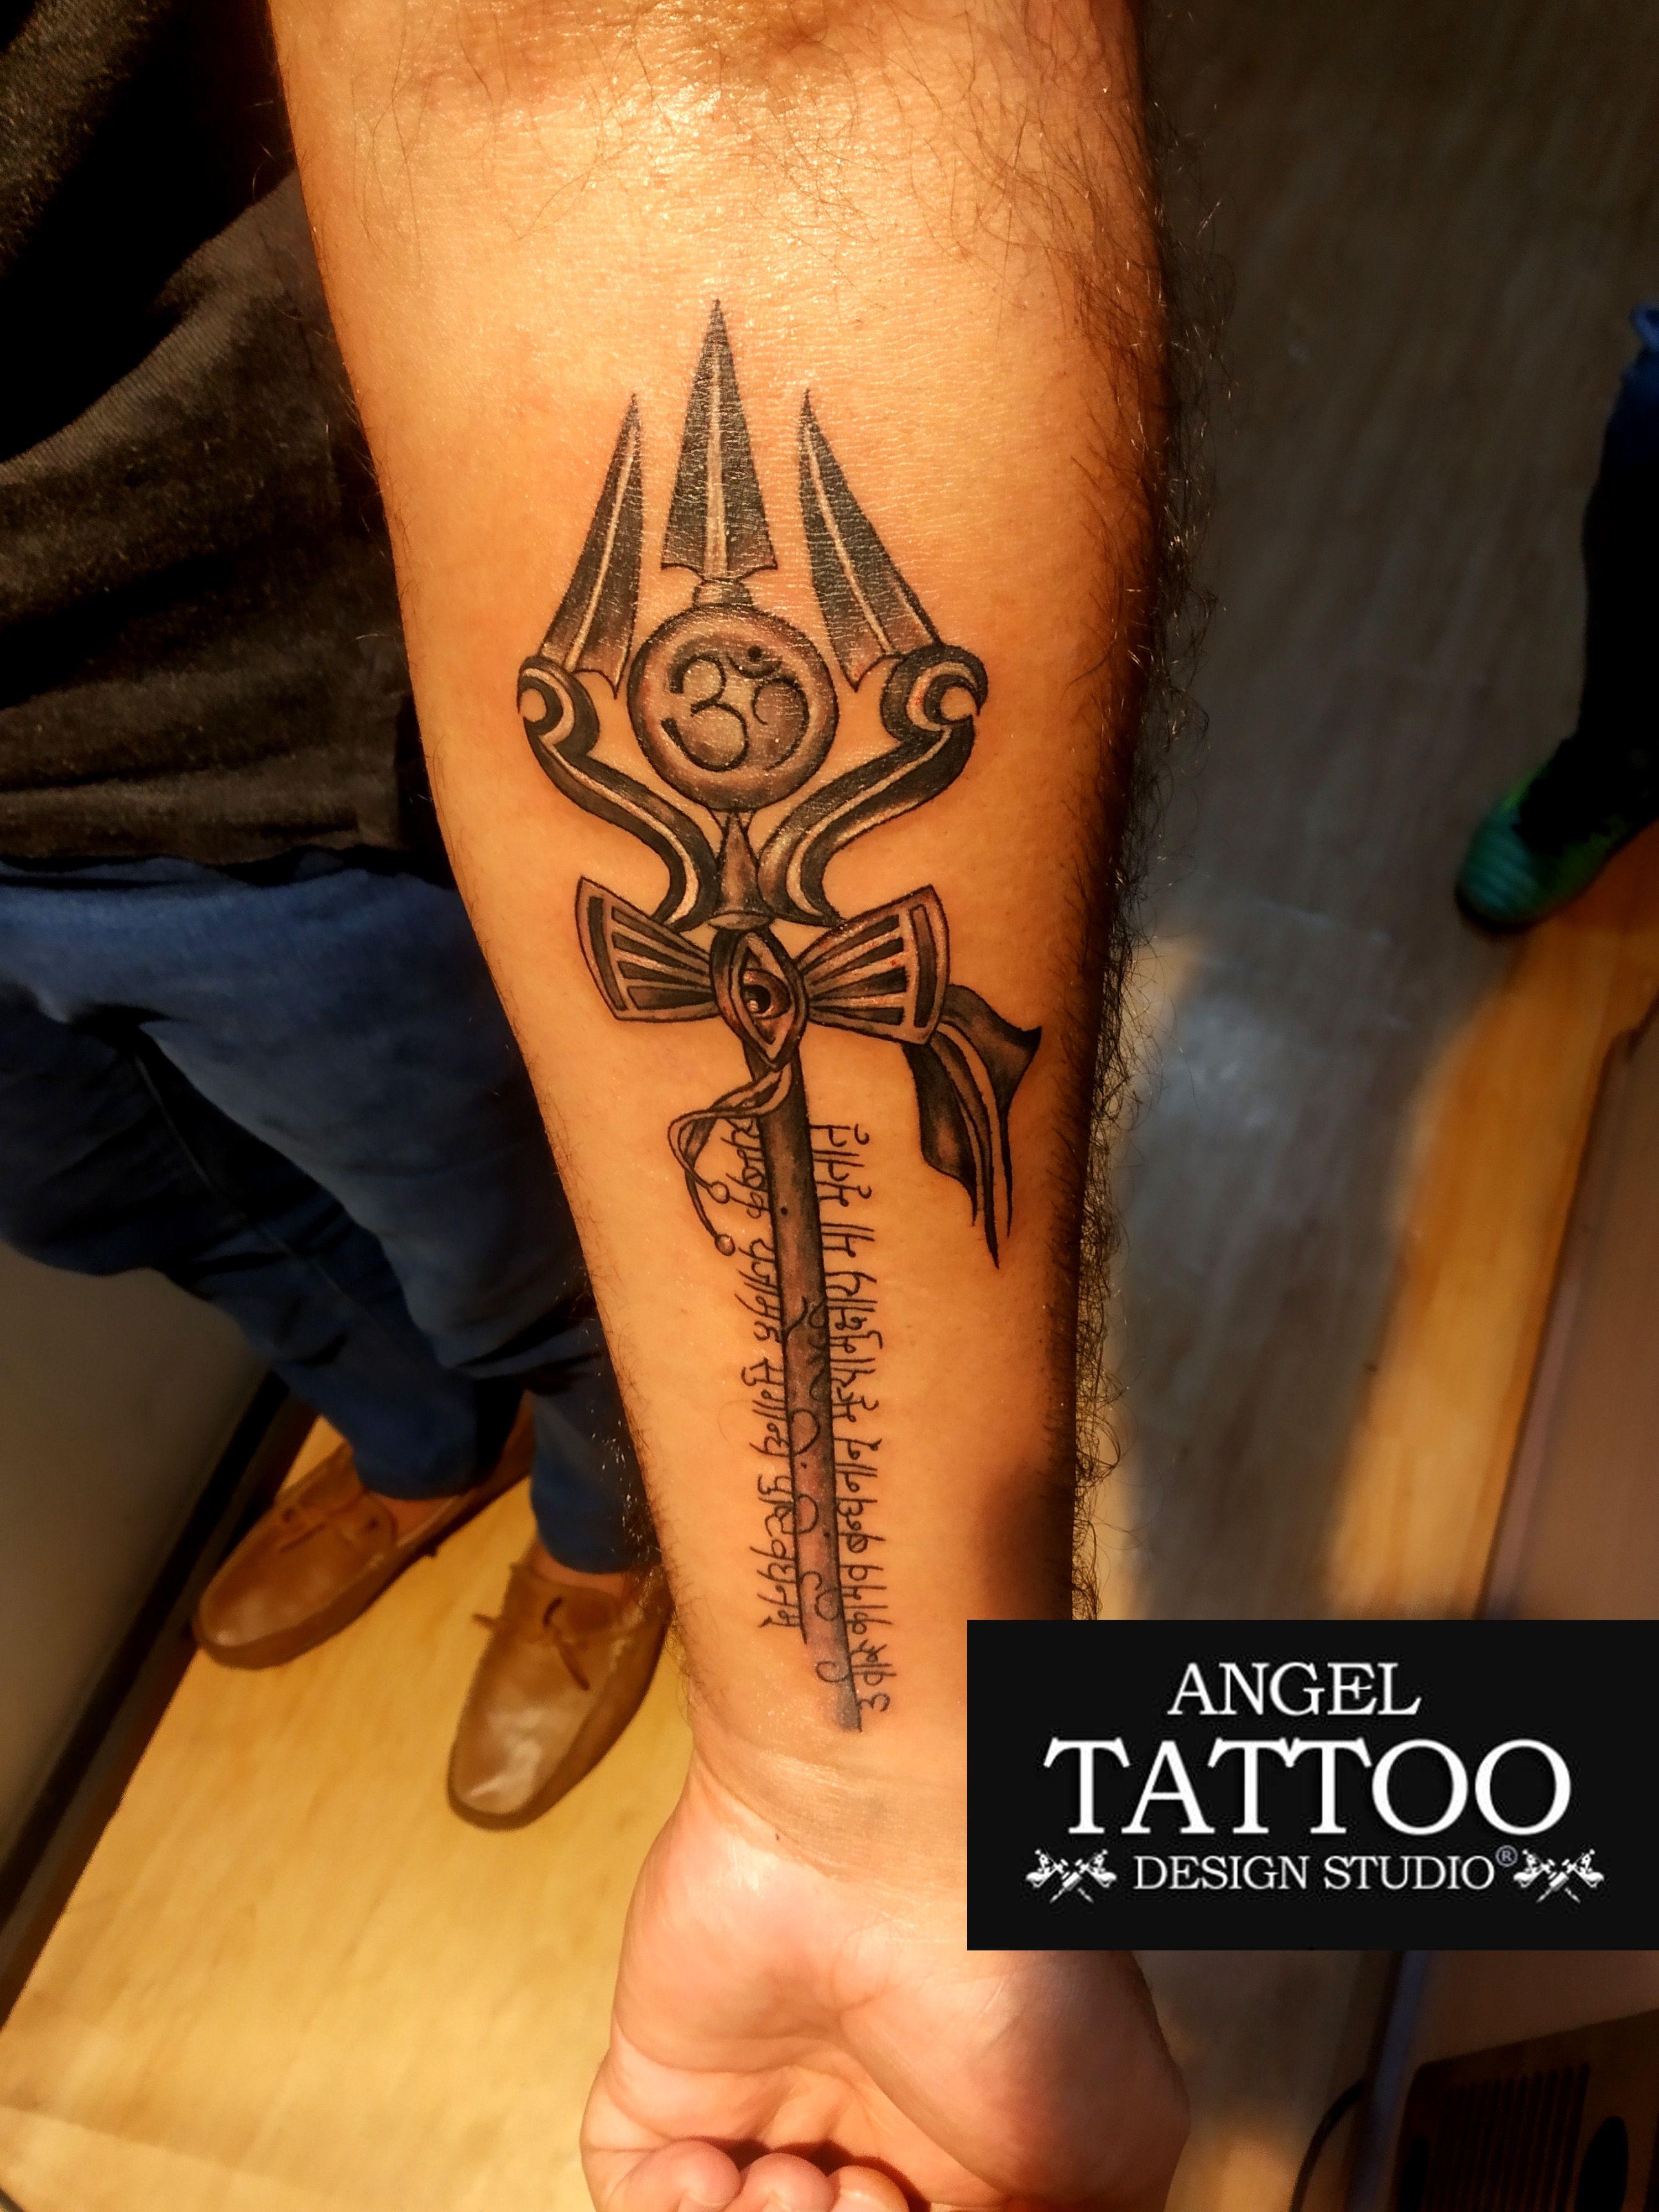 653ebbed44c9a Om Trishul Tattoo made on forearm at Angel Tattoo Design Studio- Gurgaon  #omtrishultattoo #trishultattoo #trishultattooonforearm